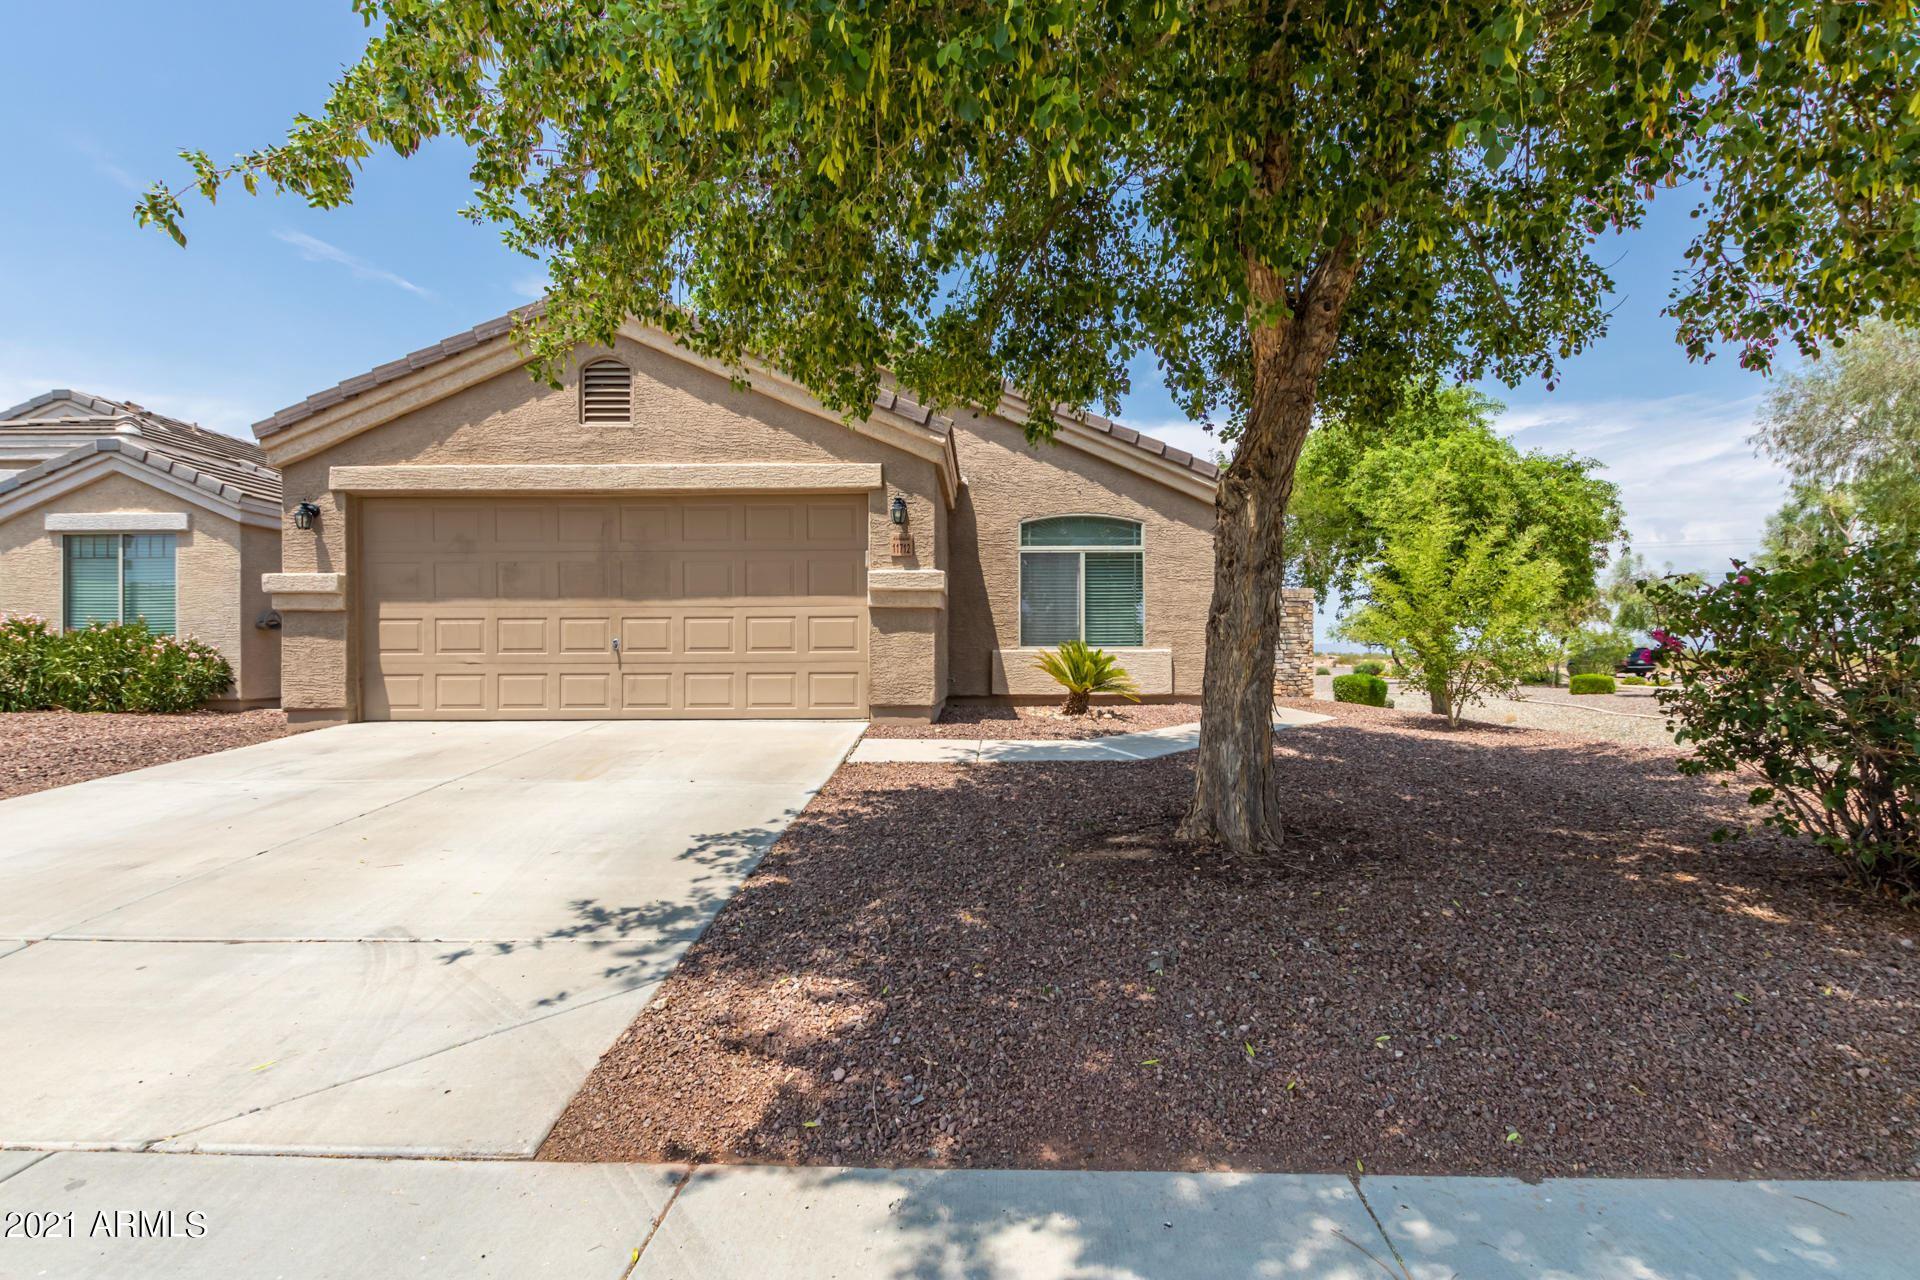 Photo of 11712 W Tierra Grande --, Sun City, AZ 85373 (MLS # 6268102)